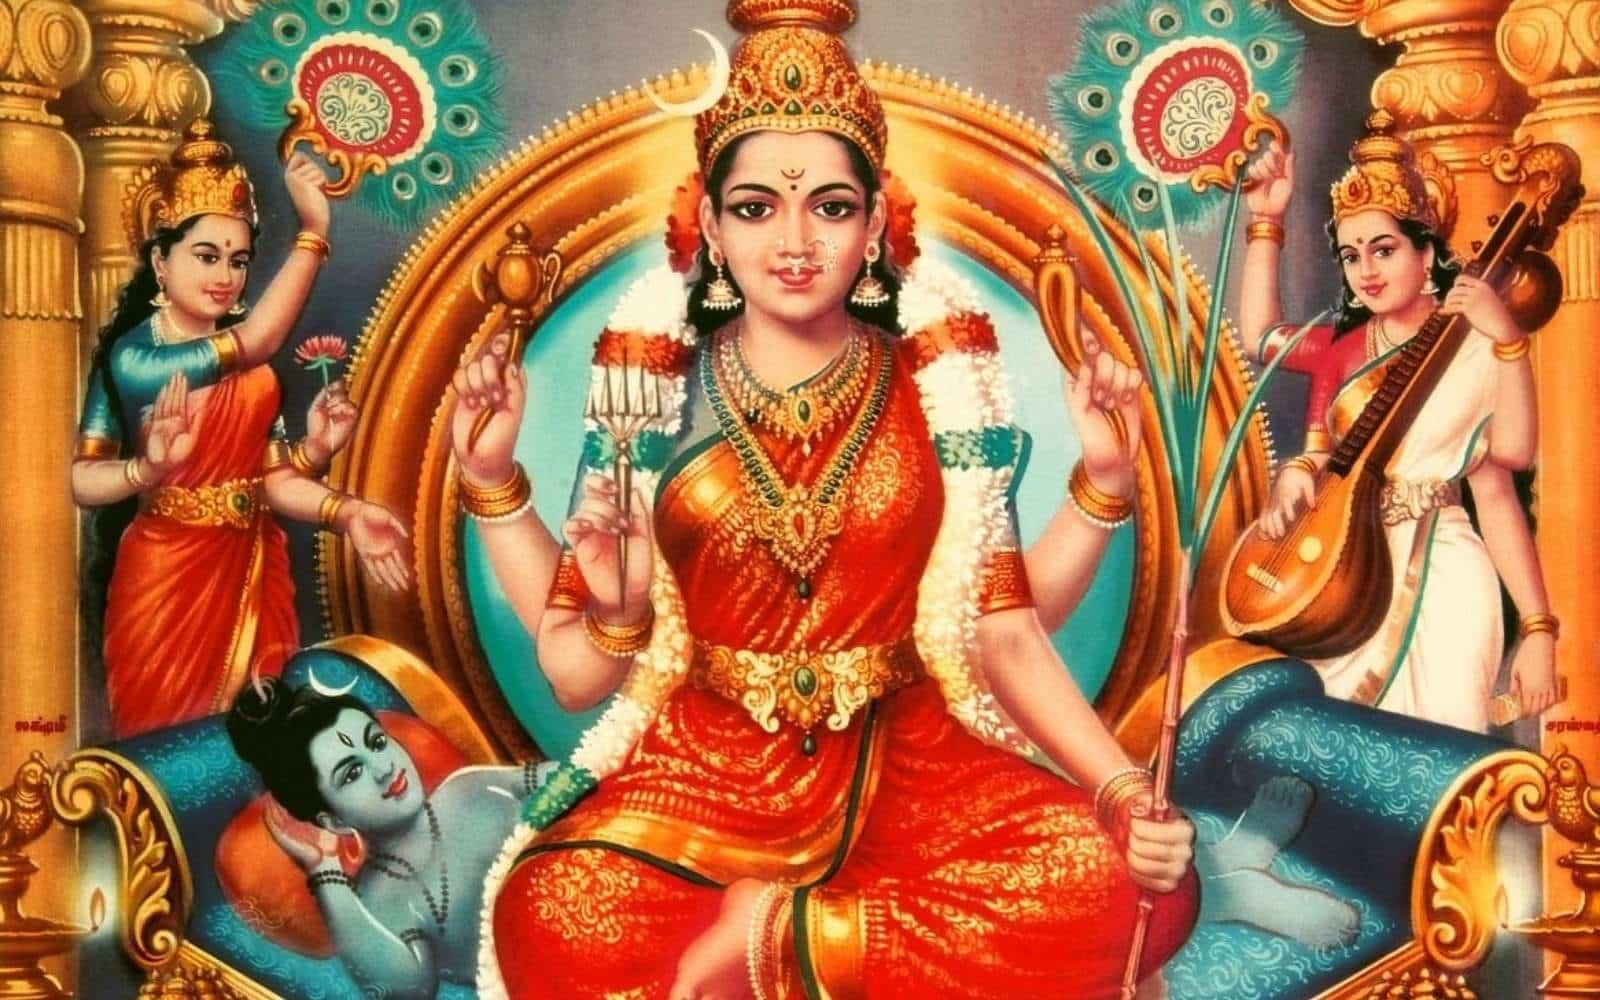 Tripura Sundari Devi